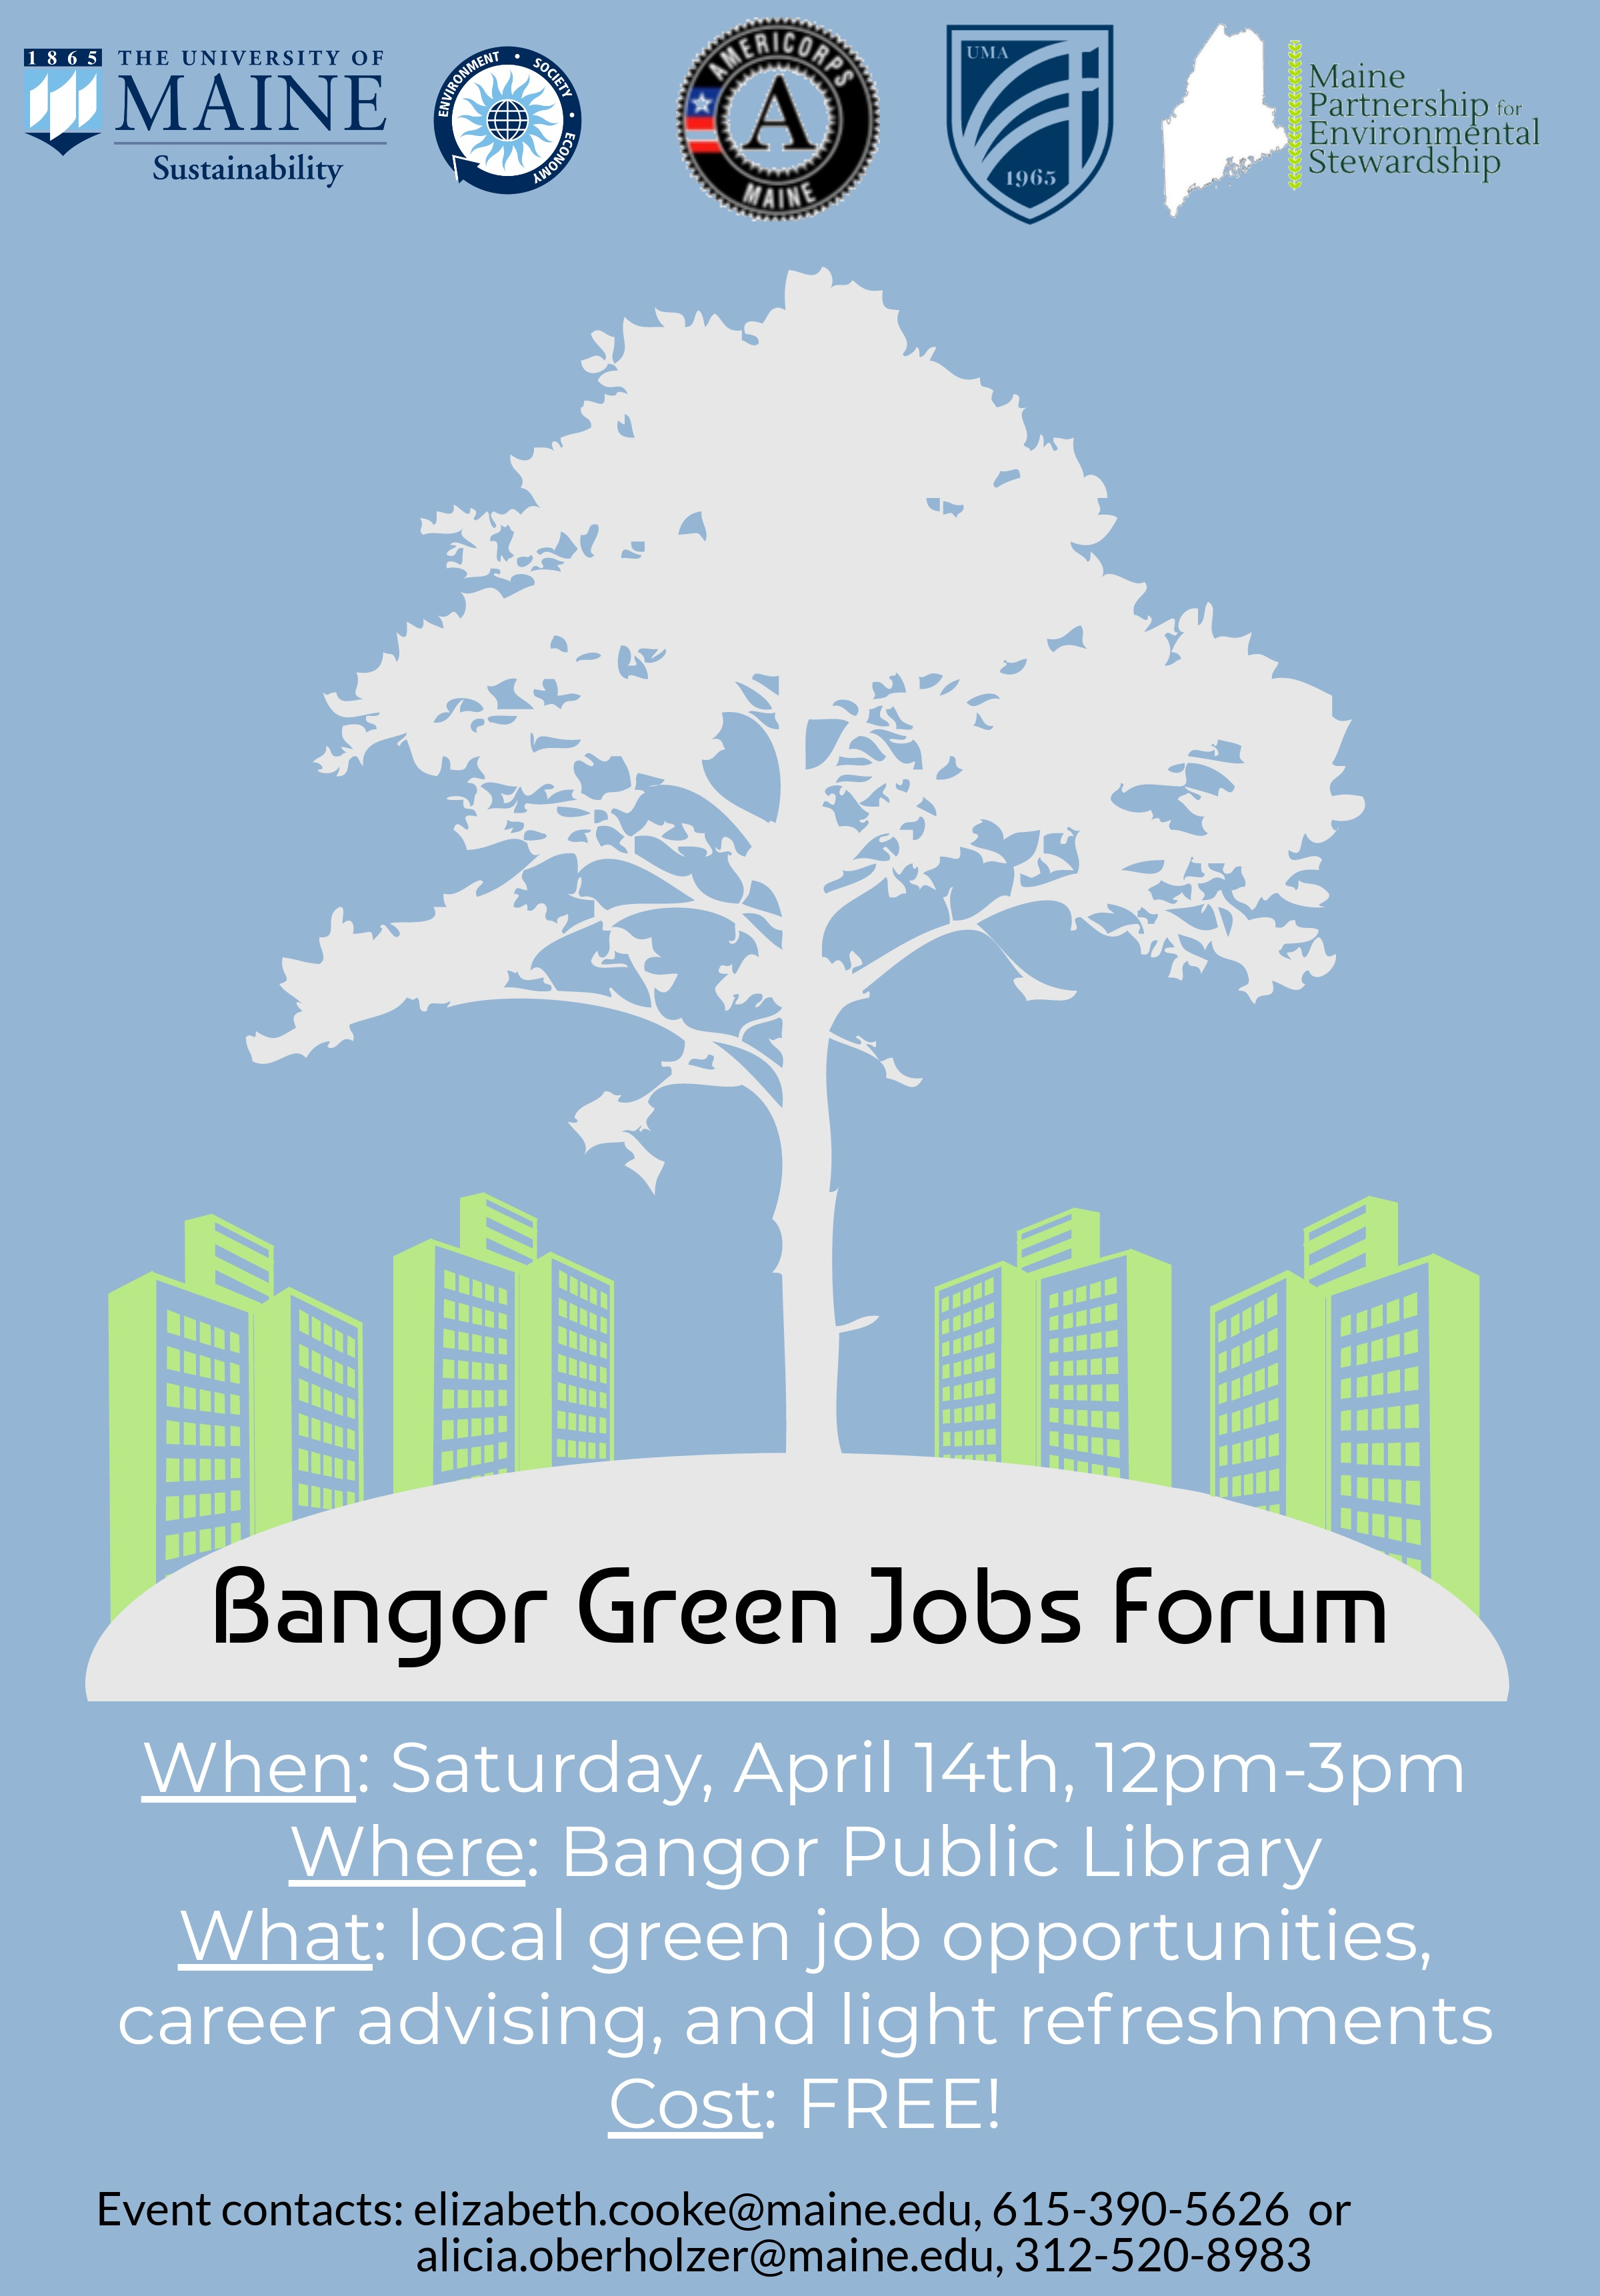 Bangor Green Jobs Forum - Career Center - University of Maine